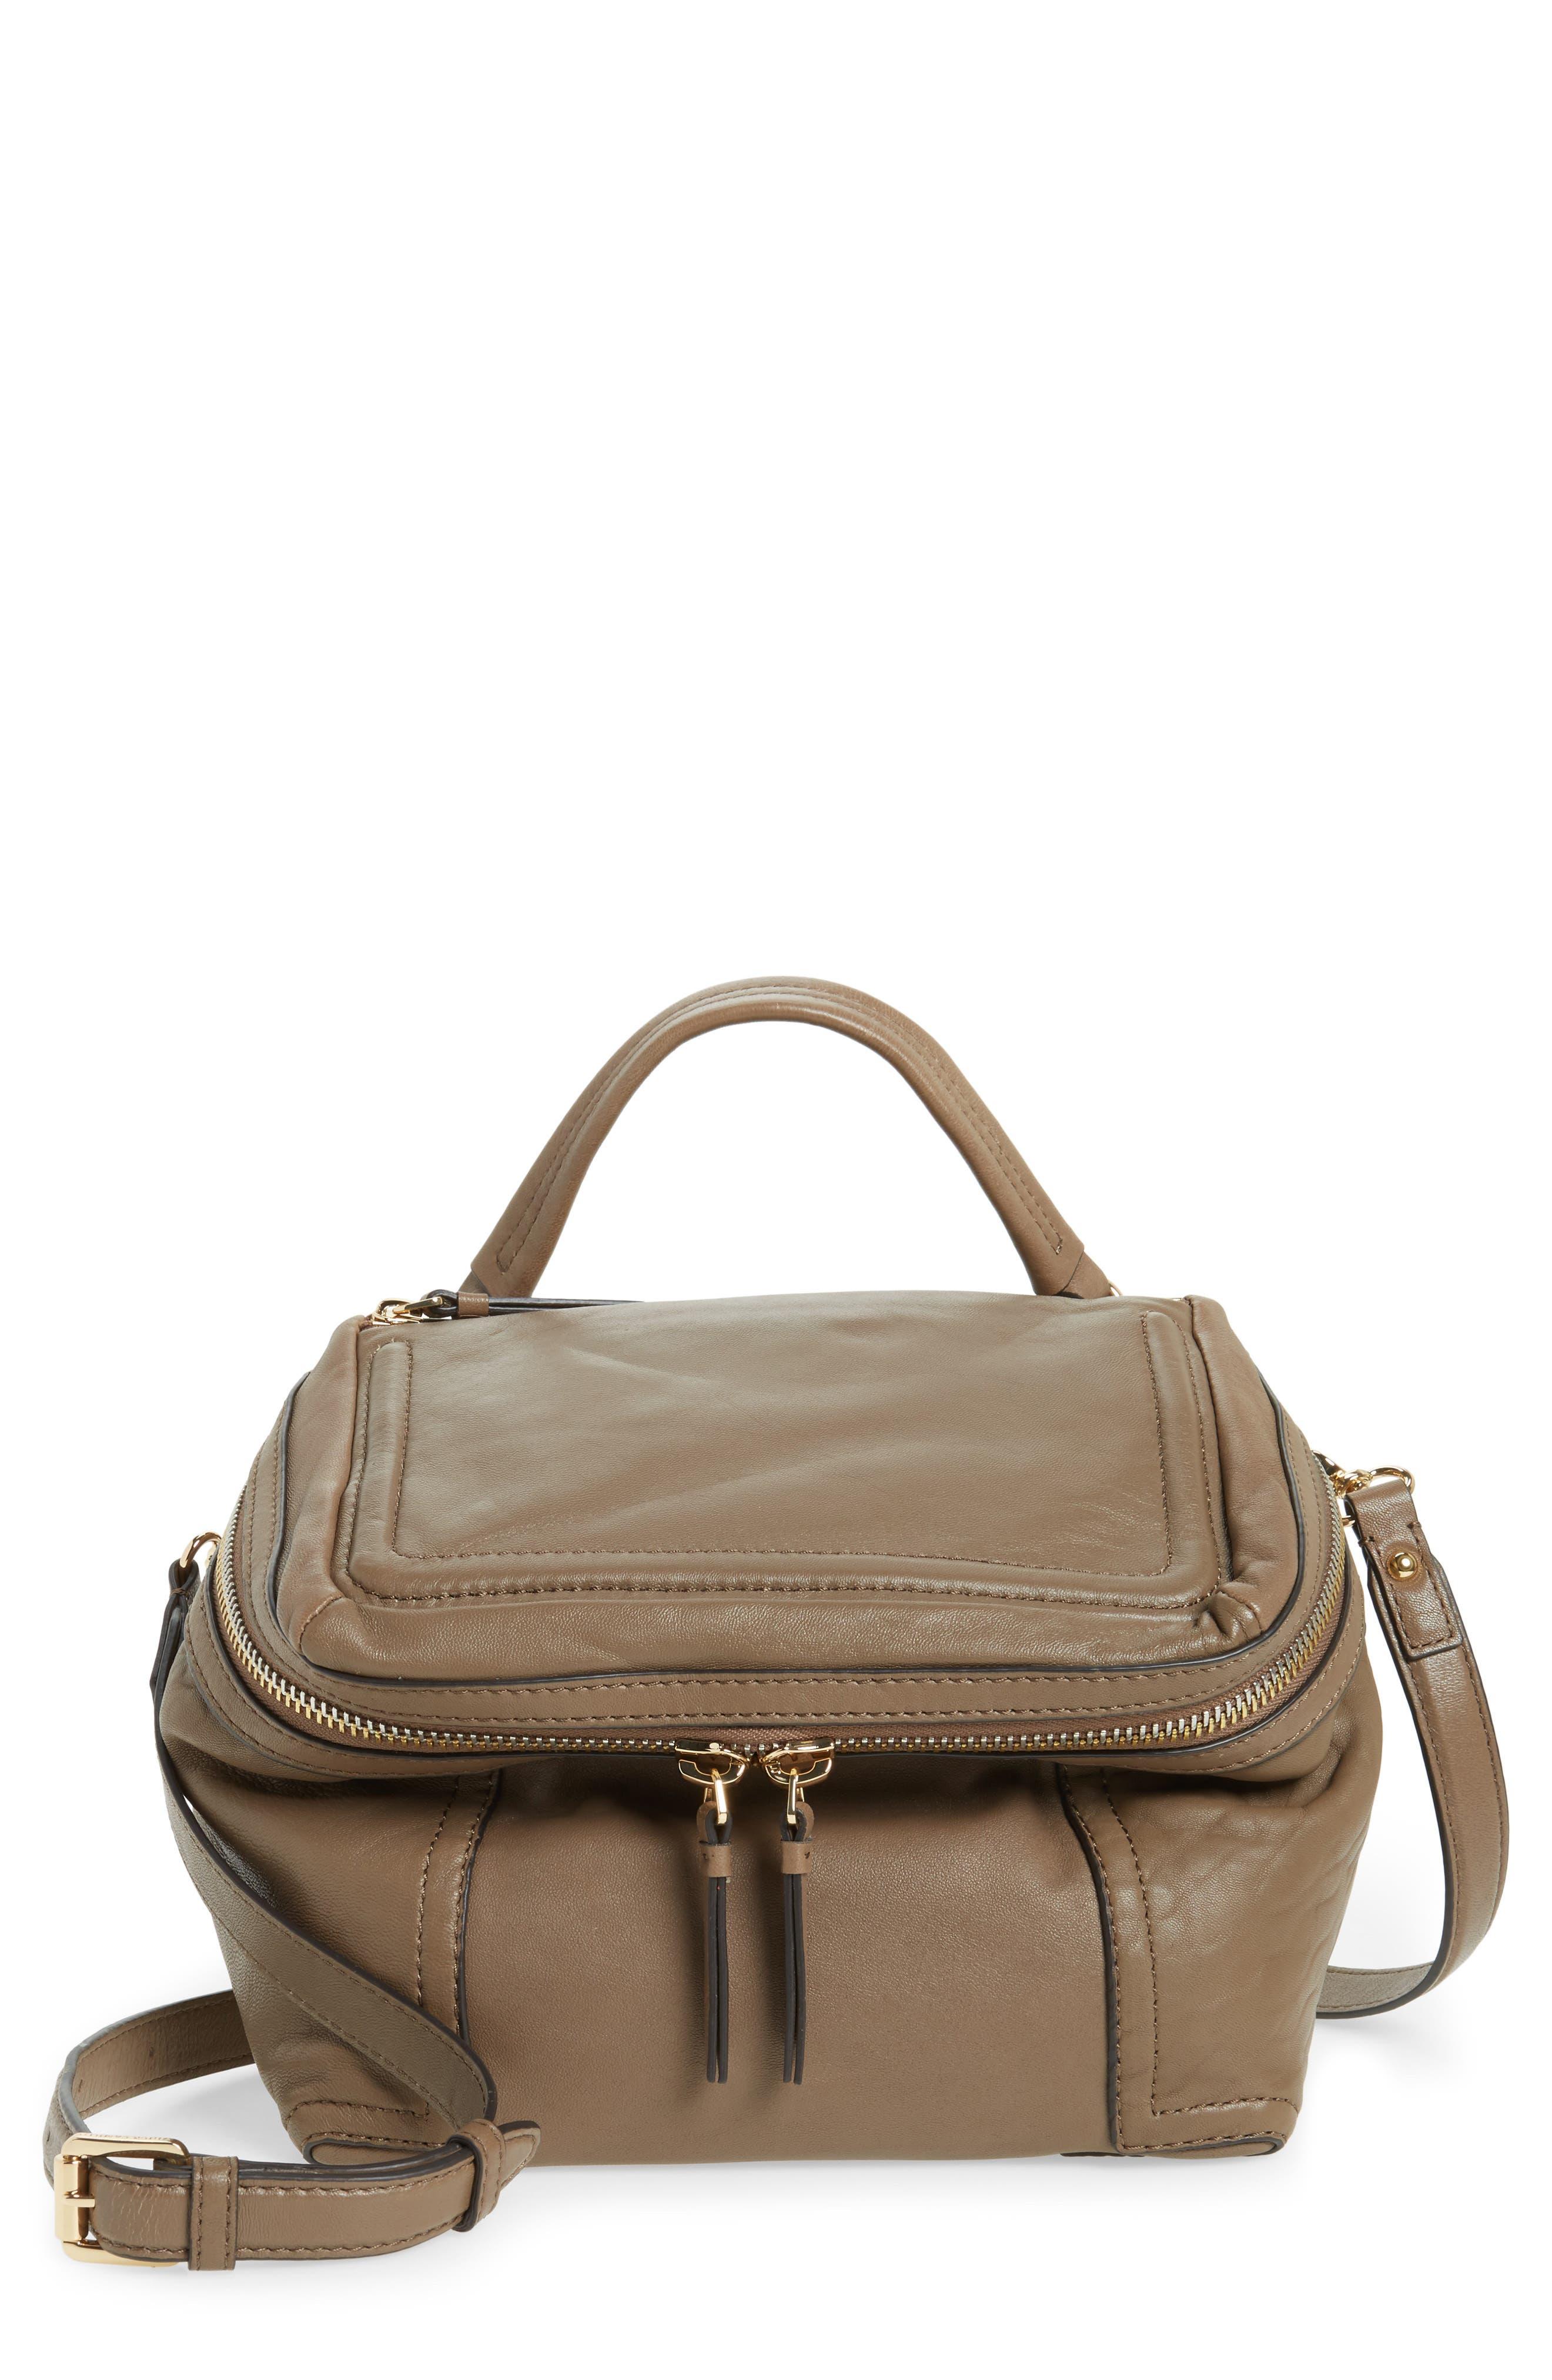 Vince Camuto Medium Patch Leather Crossbody Bag